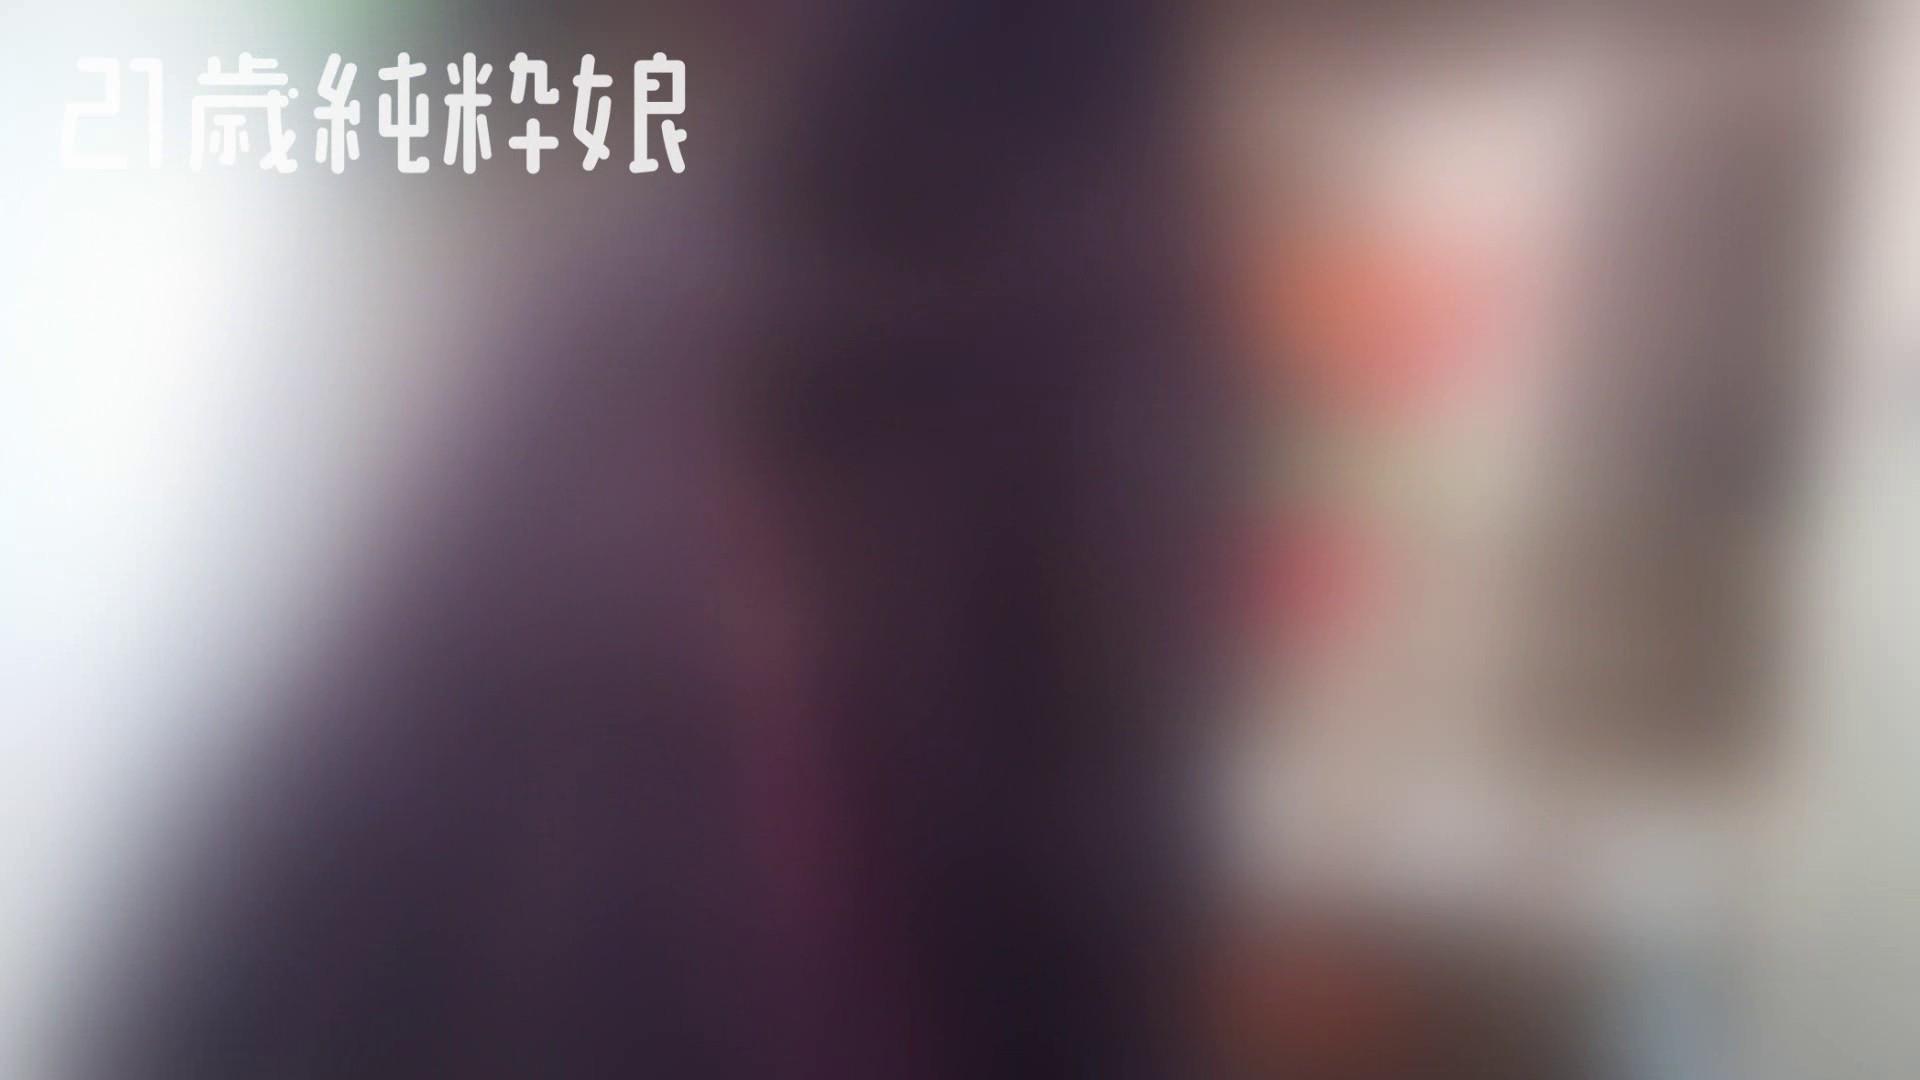 Gカップ21歳純粋嬢第2弾Vol.5 OLヌード天国  110PIX 6